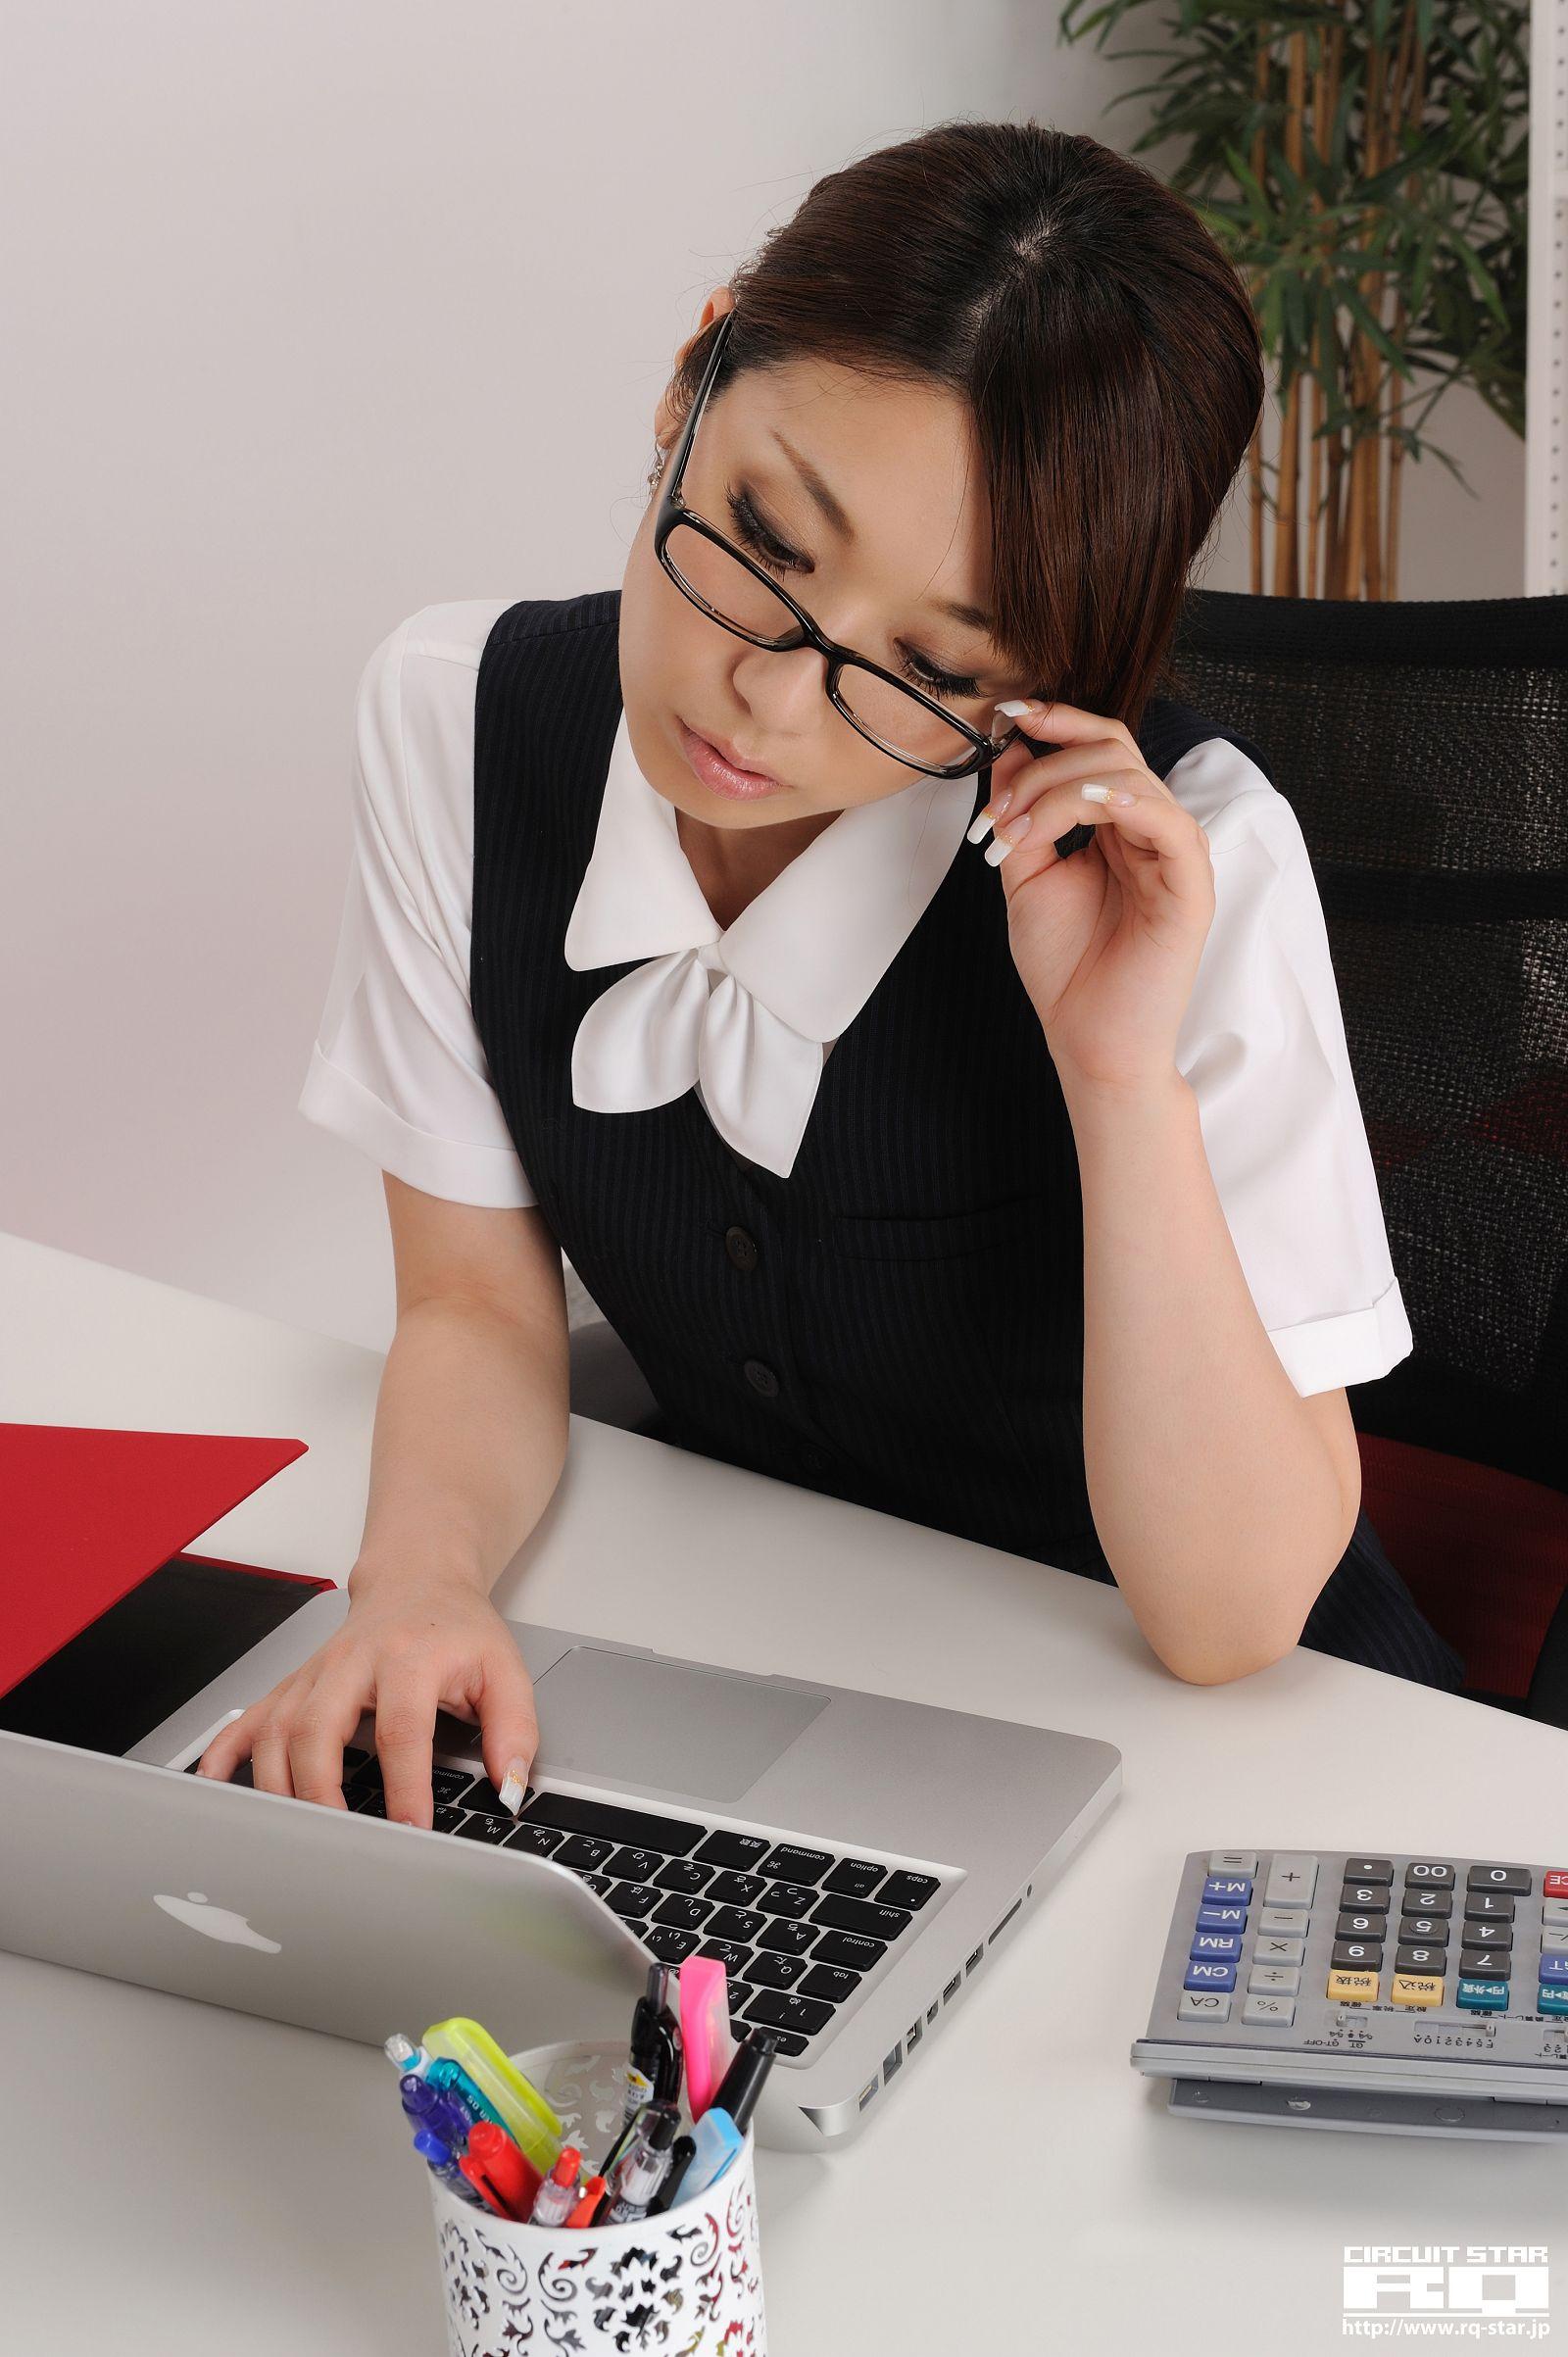 [RQ STAR美女] NO.0294 Emi Shimizu 清水恵美 Office Lady[160P] RQ STAR 第3张